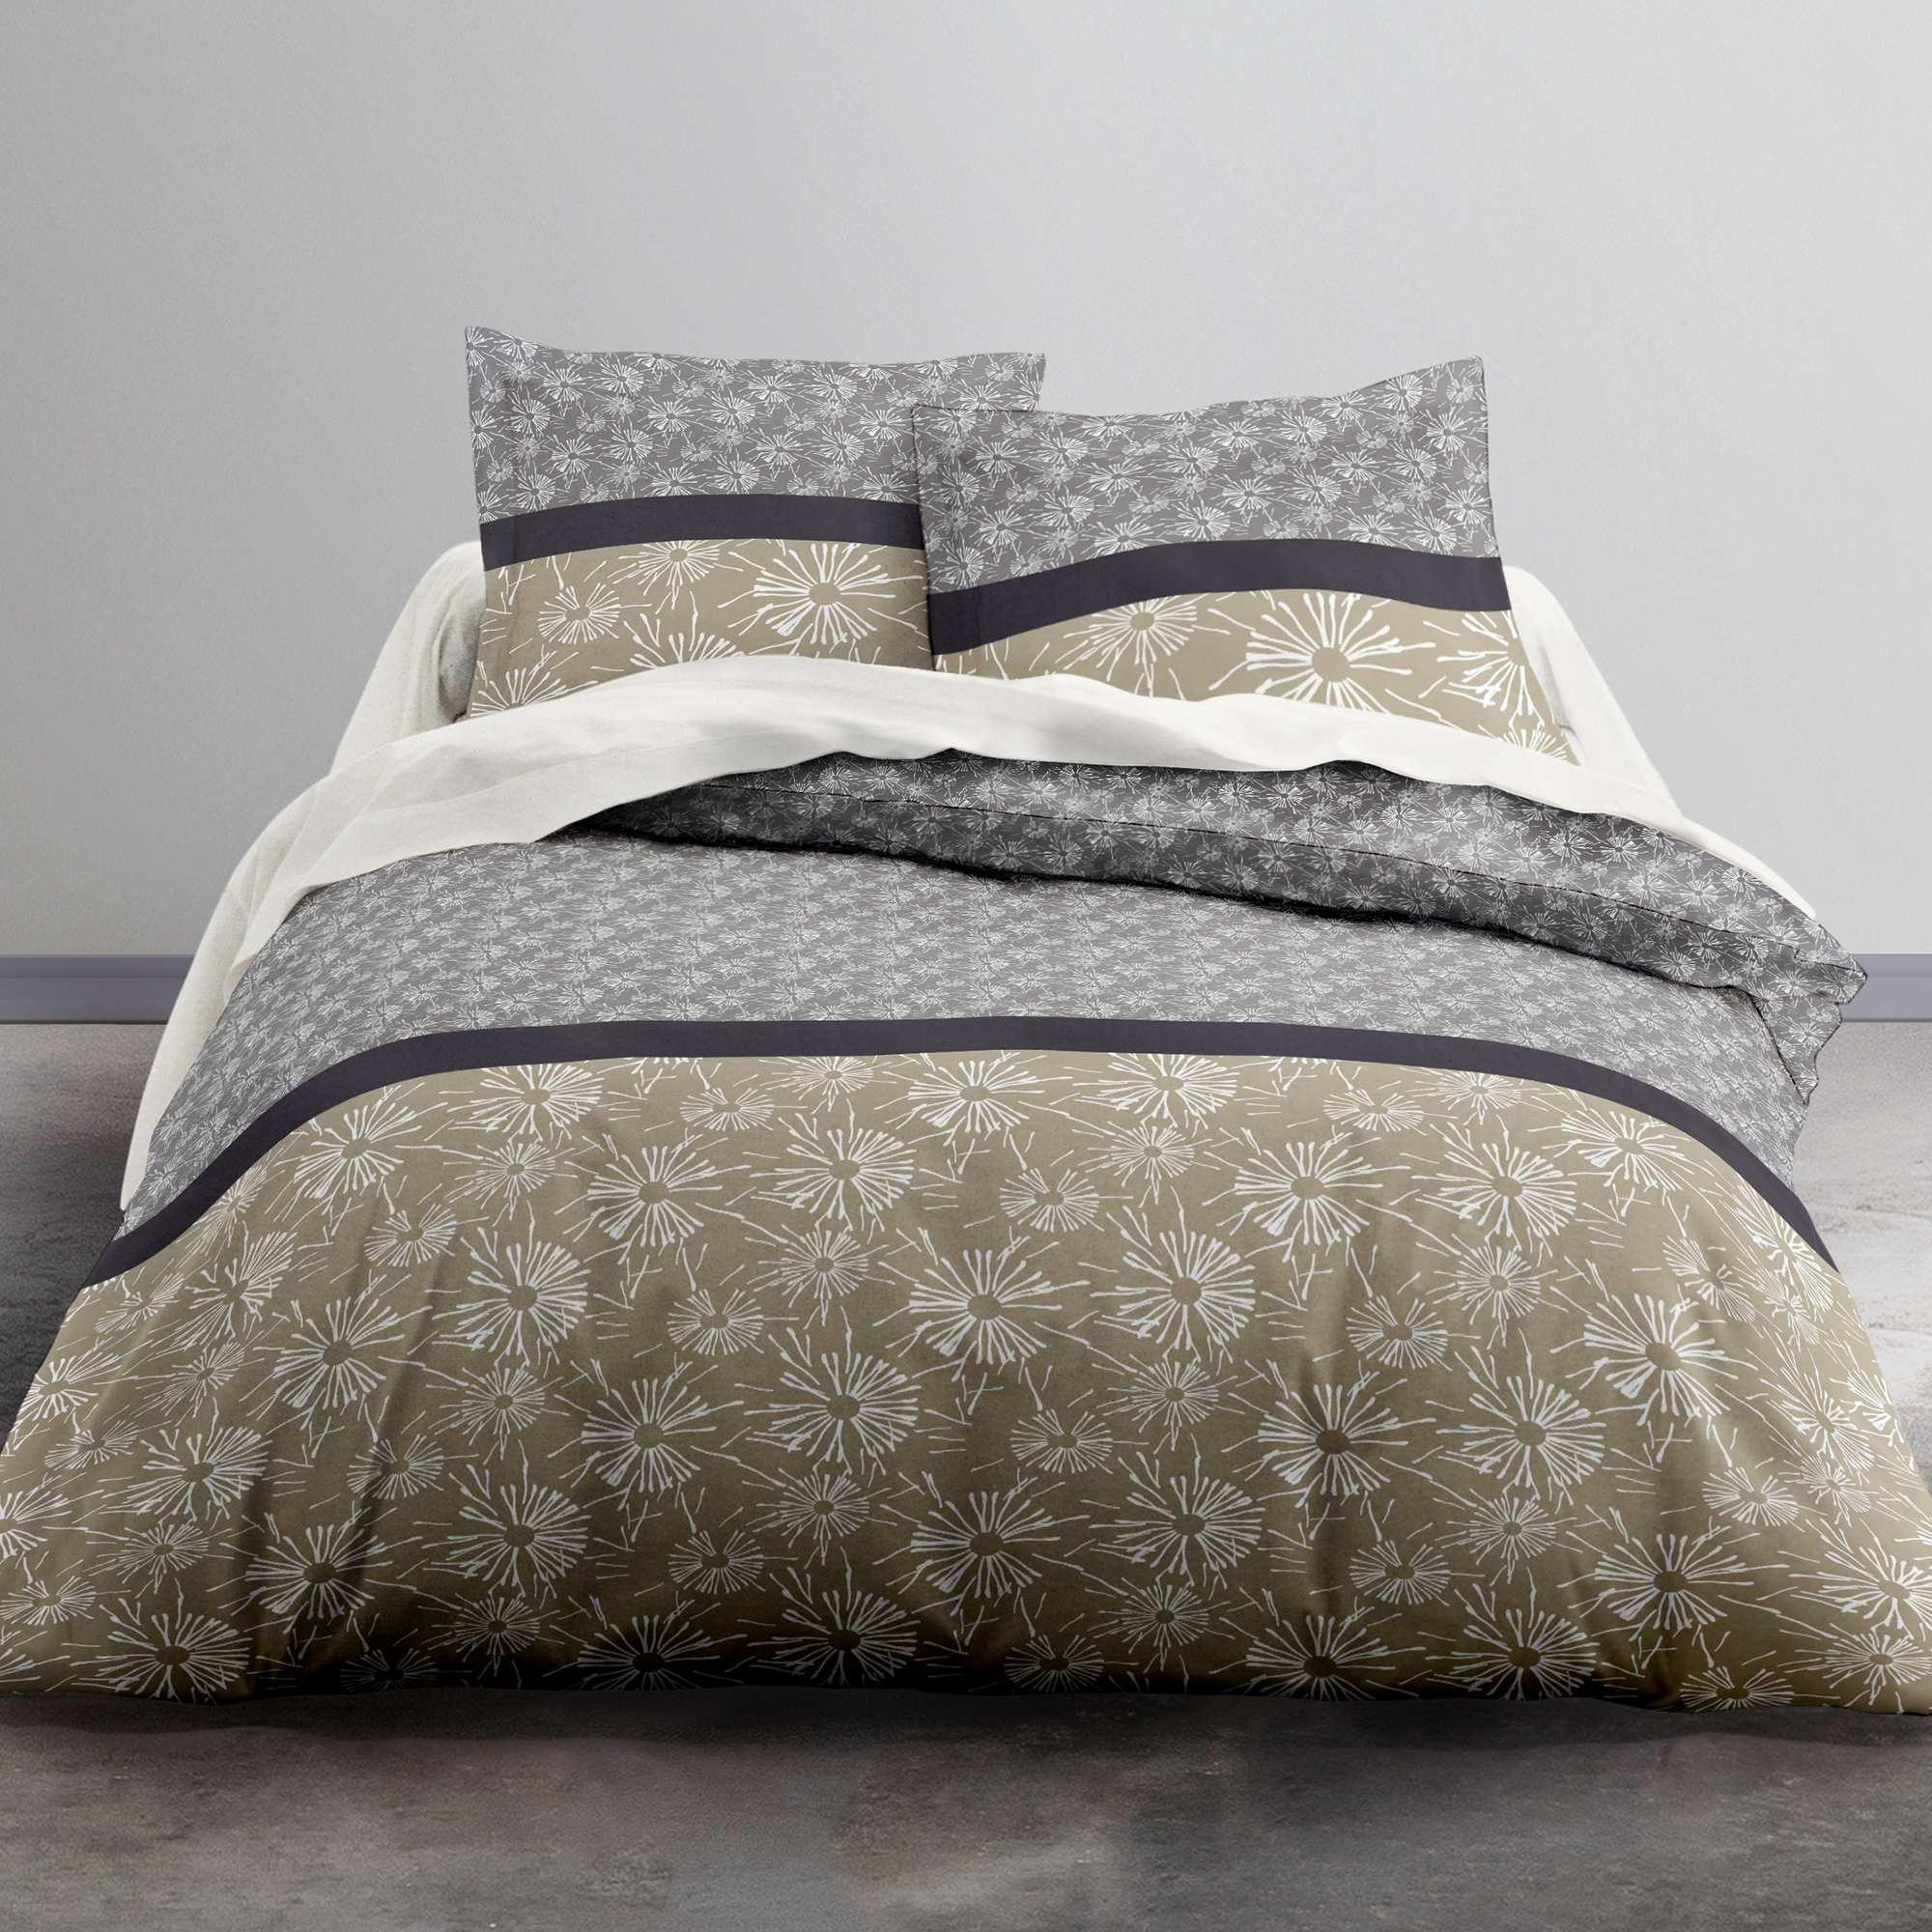 Juego de cama doble de algod n hogar gris beige kiabi for Cama doble nina